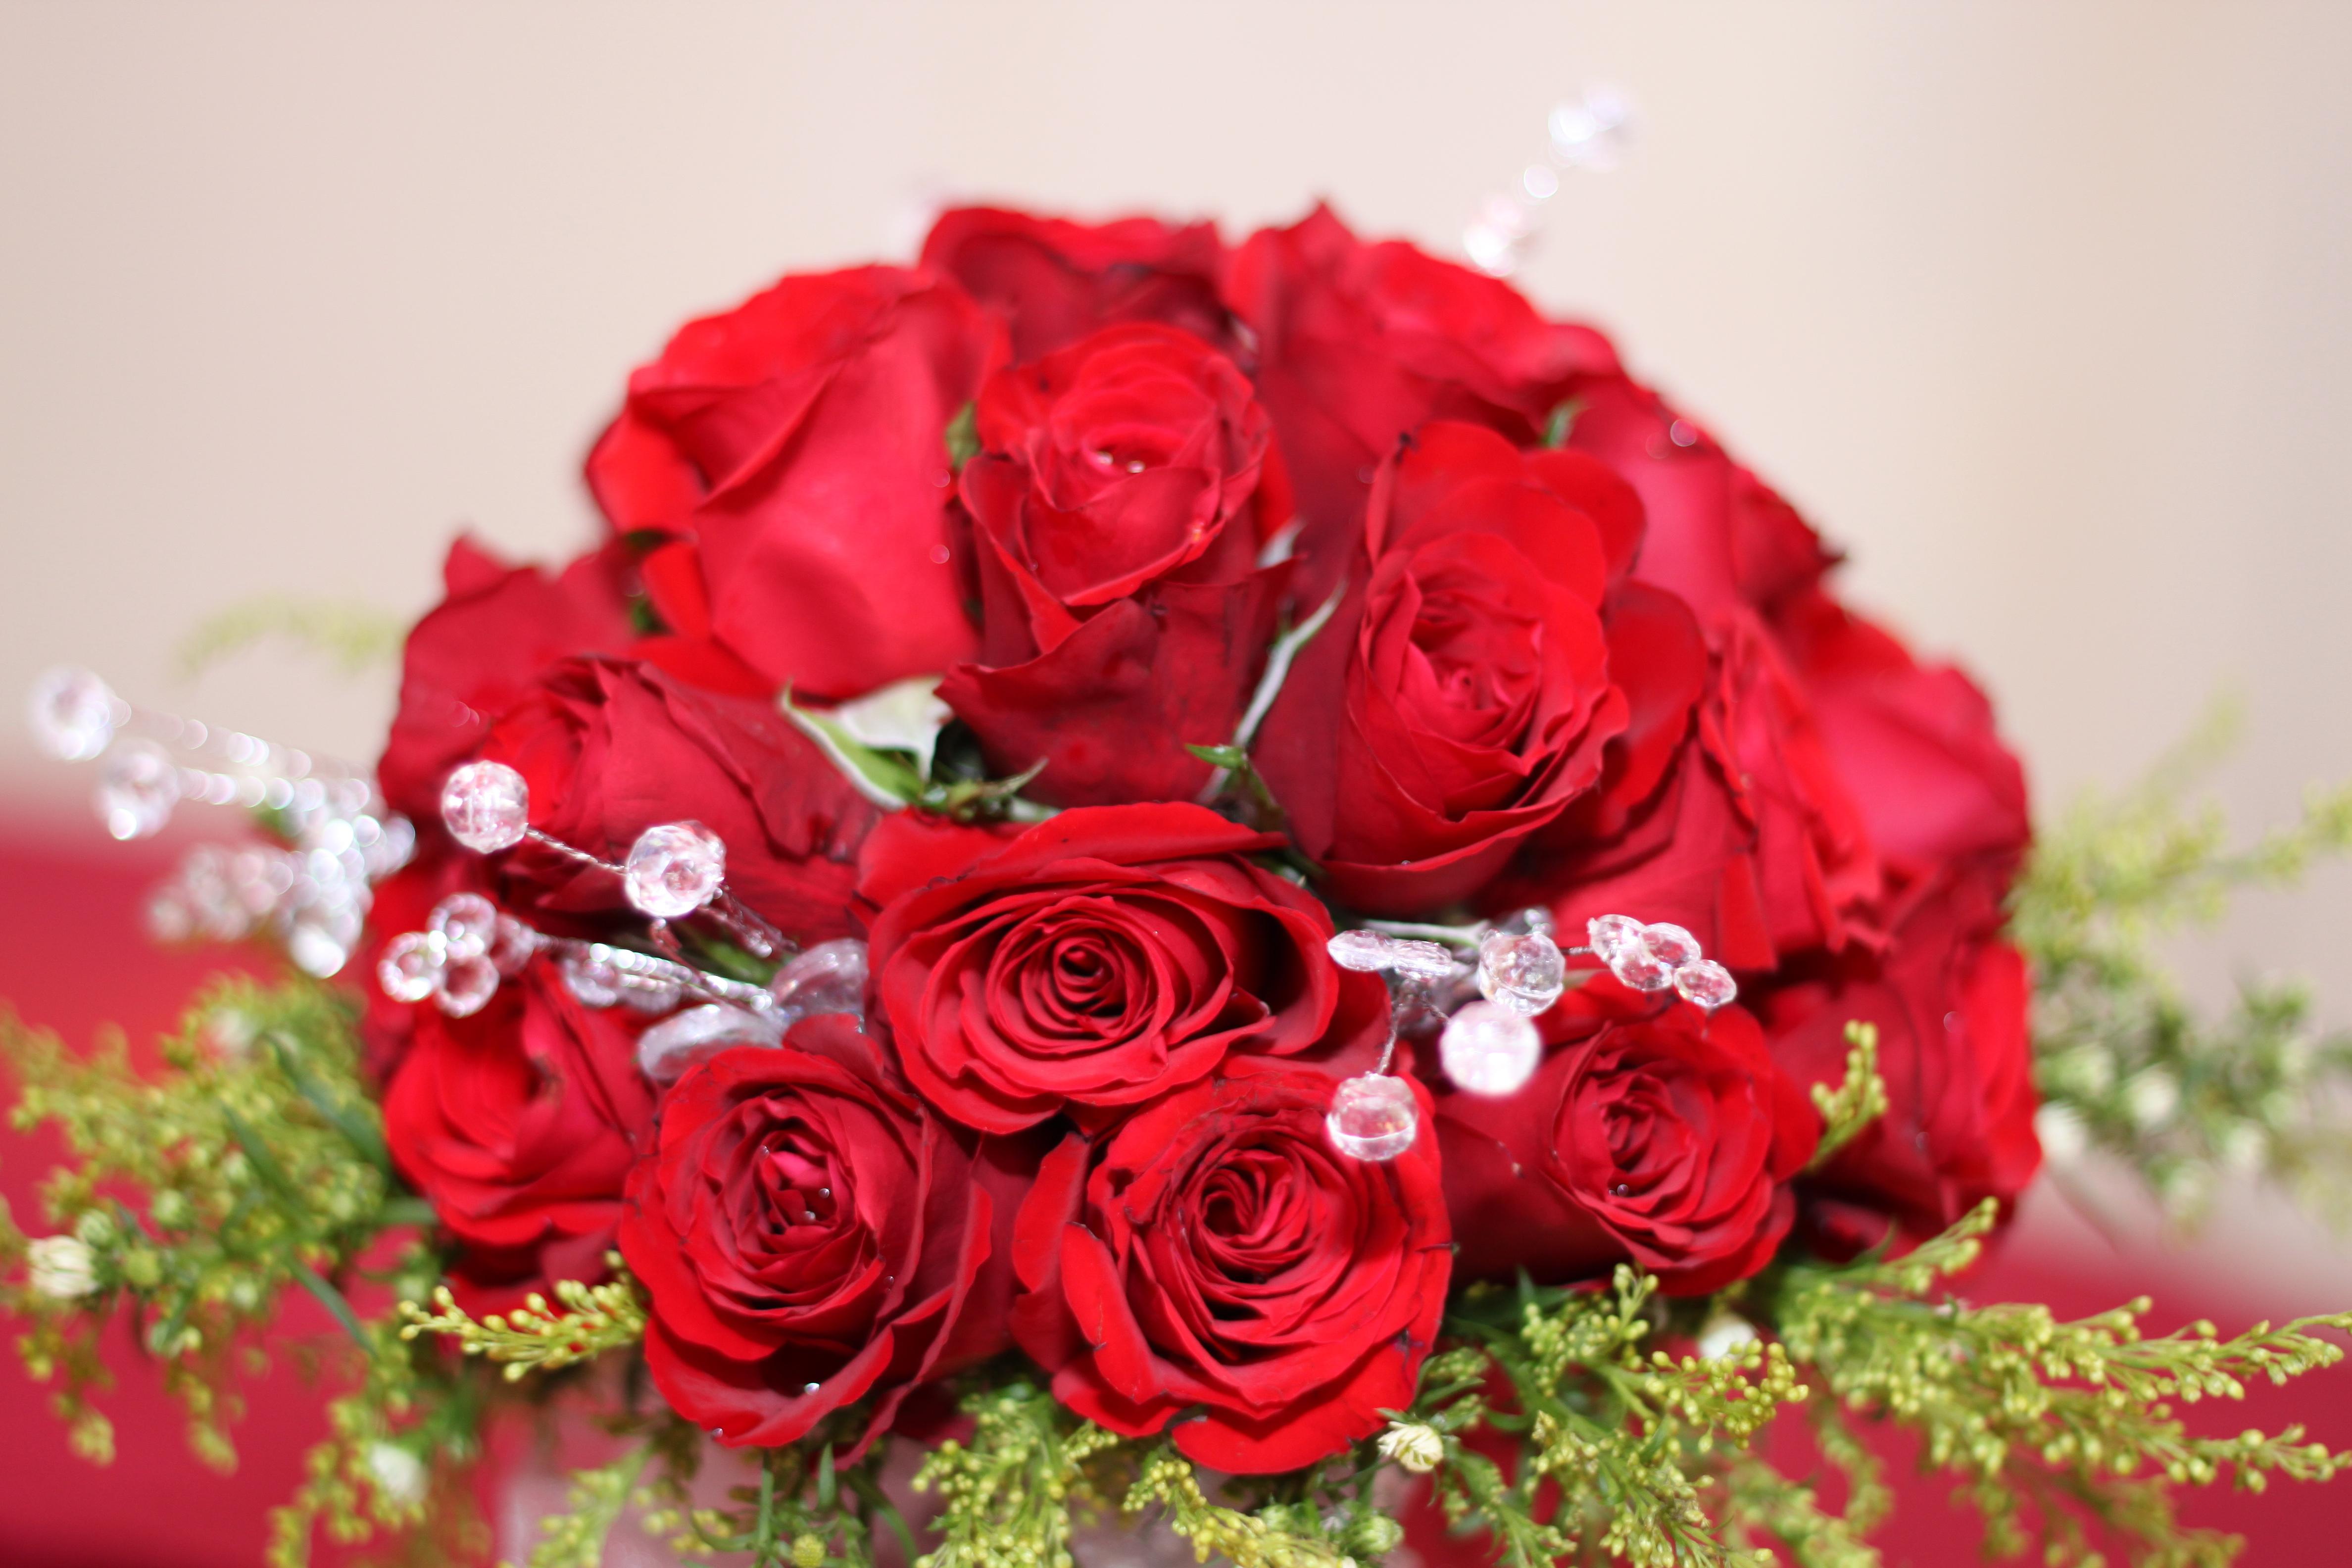 Картинка с 8 марта с розами, брата день